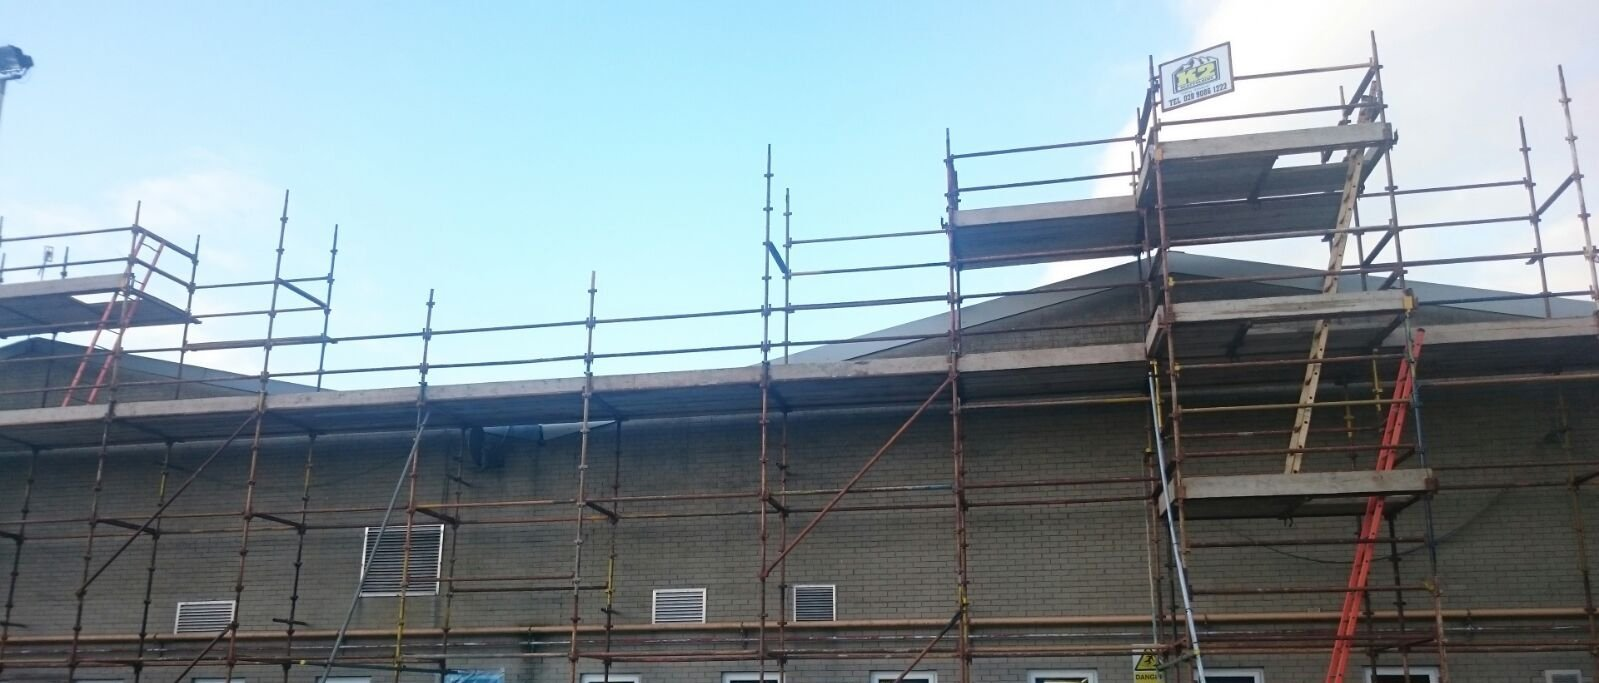 A reputable scaffolding company in Newtownabbey